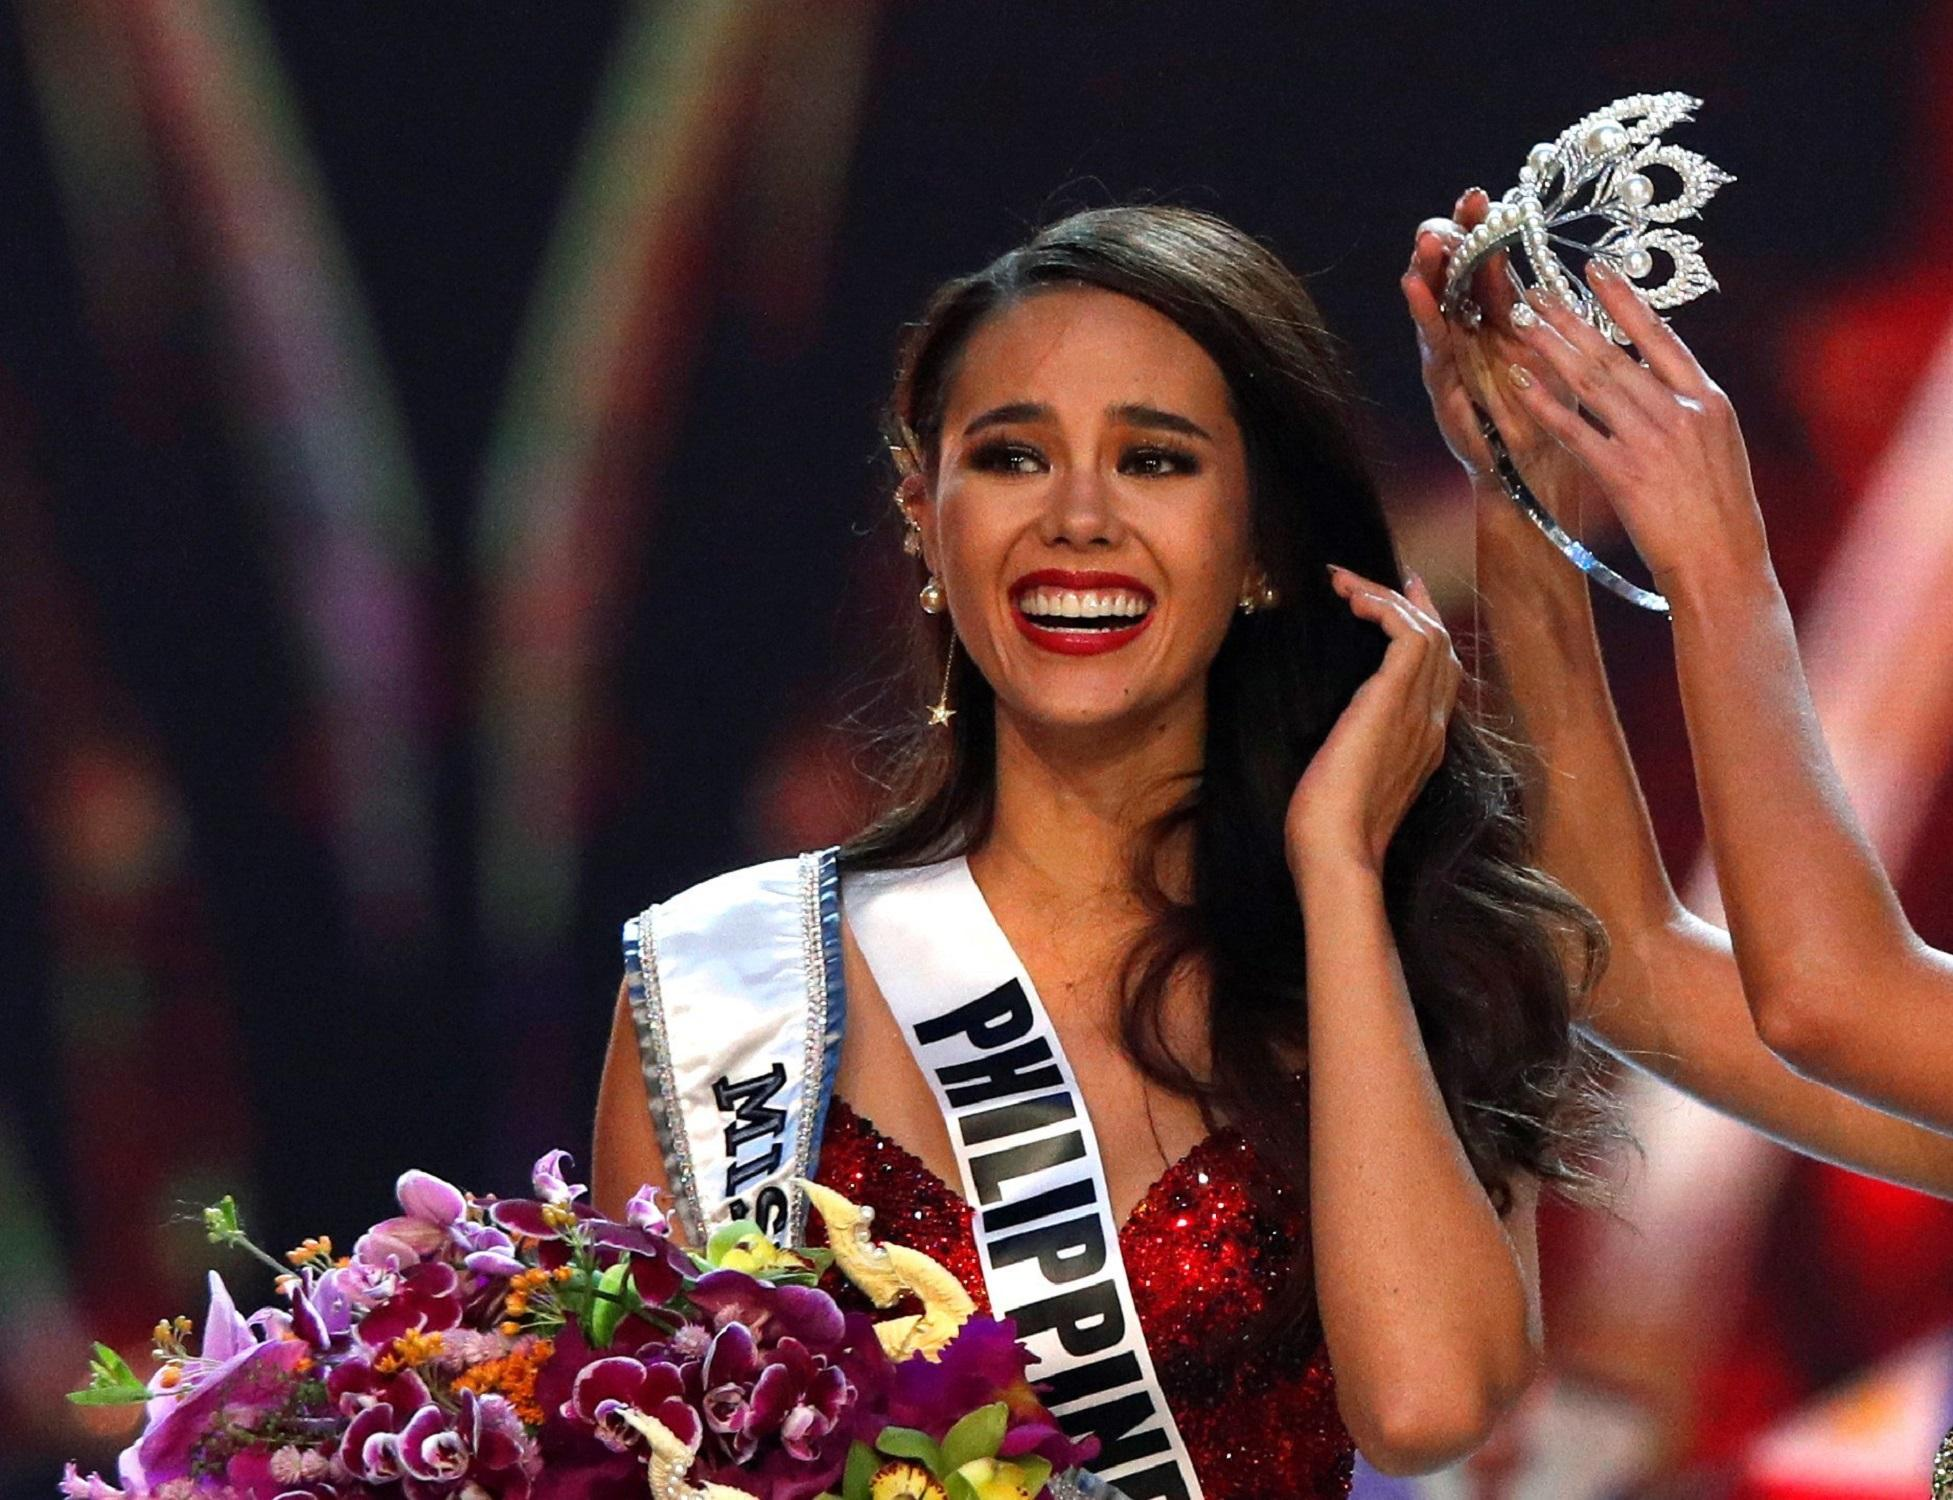 Catriona es la cuarta filipina en ganar la corona de Miss Universo ...